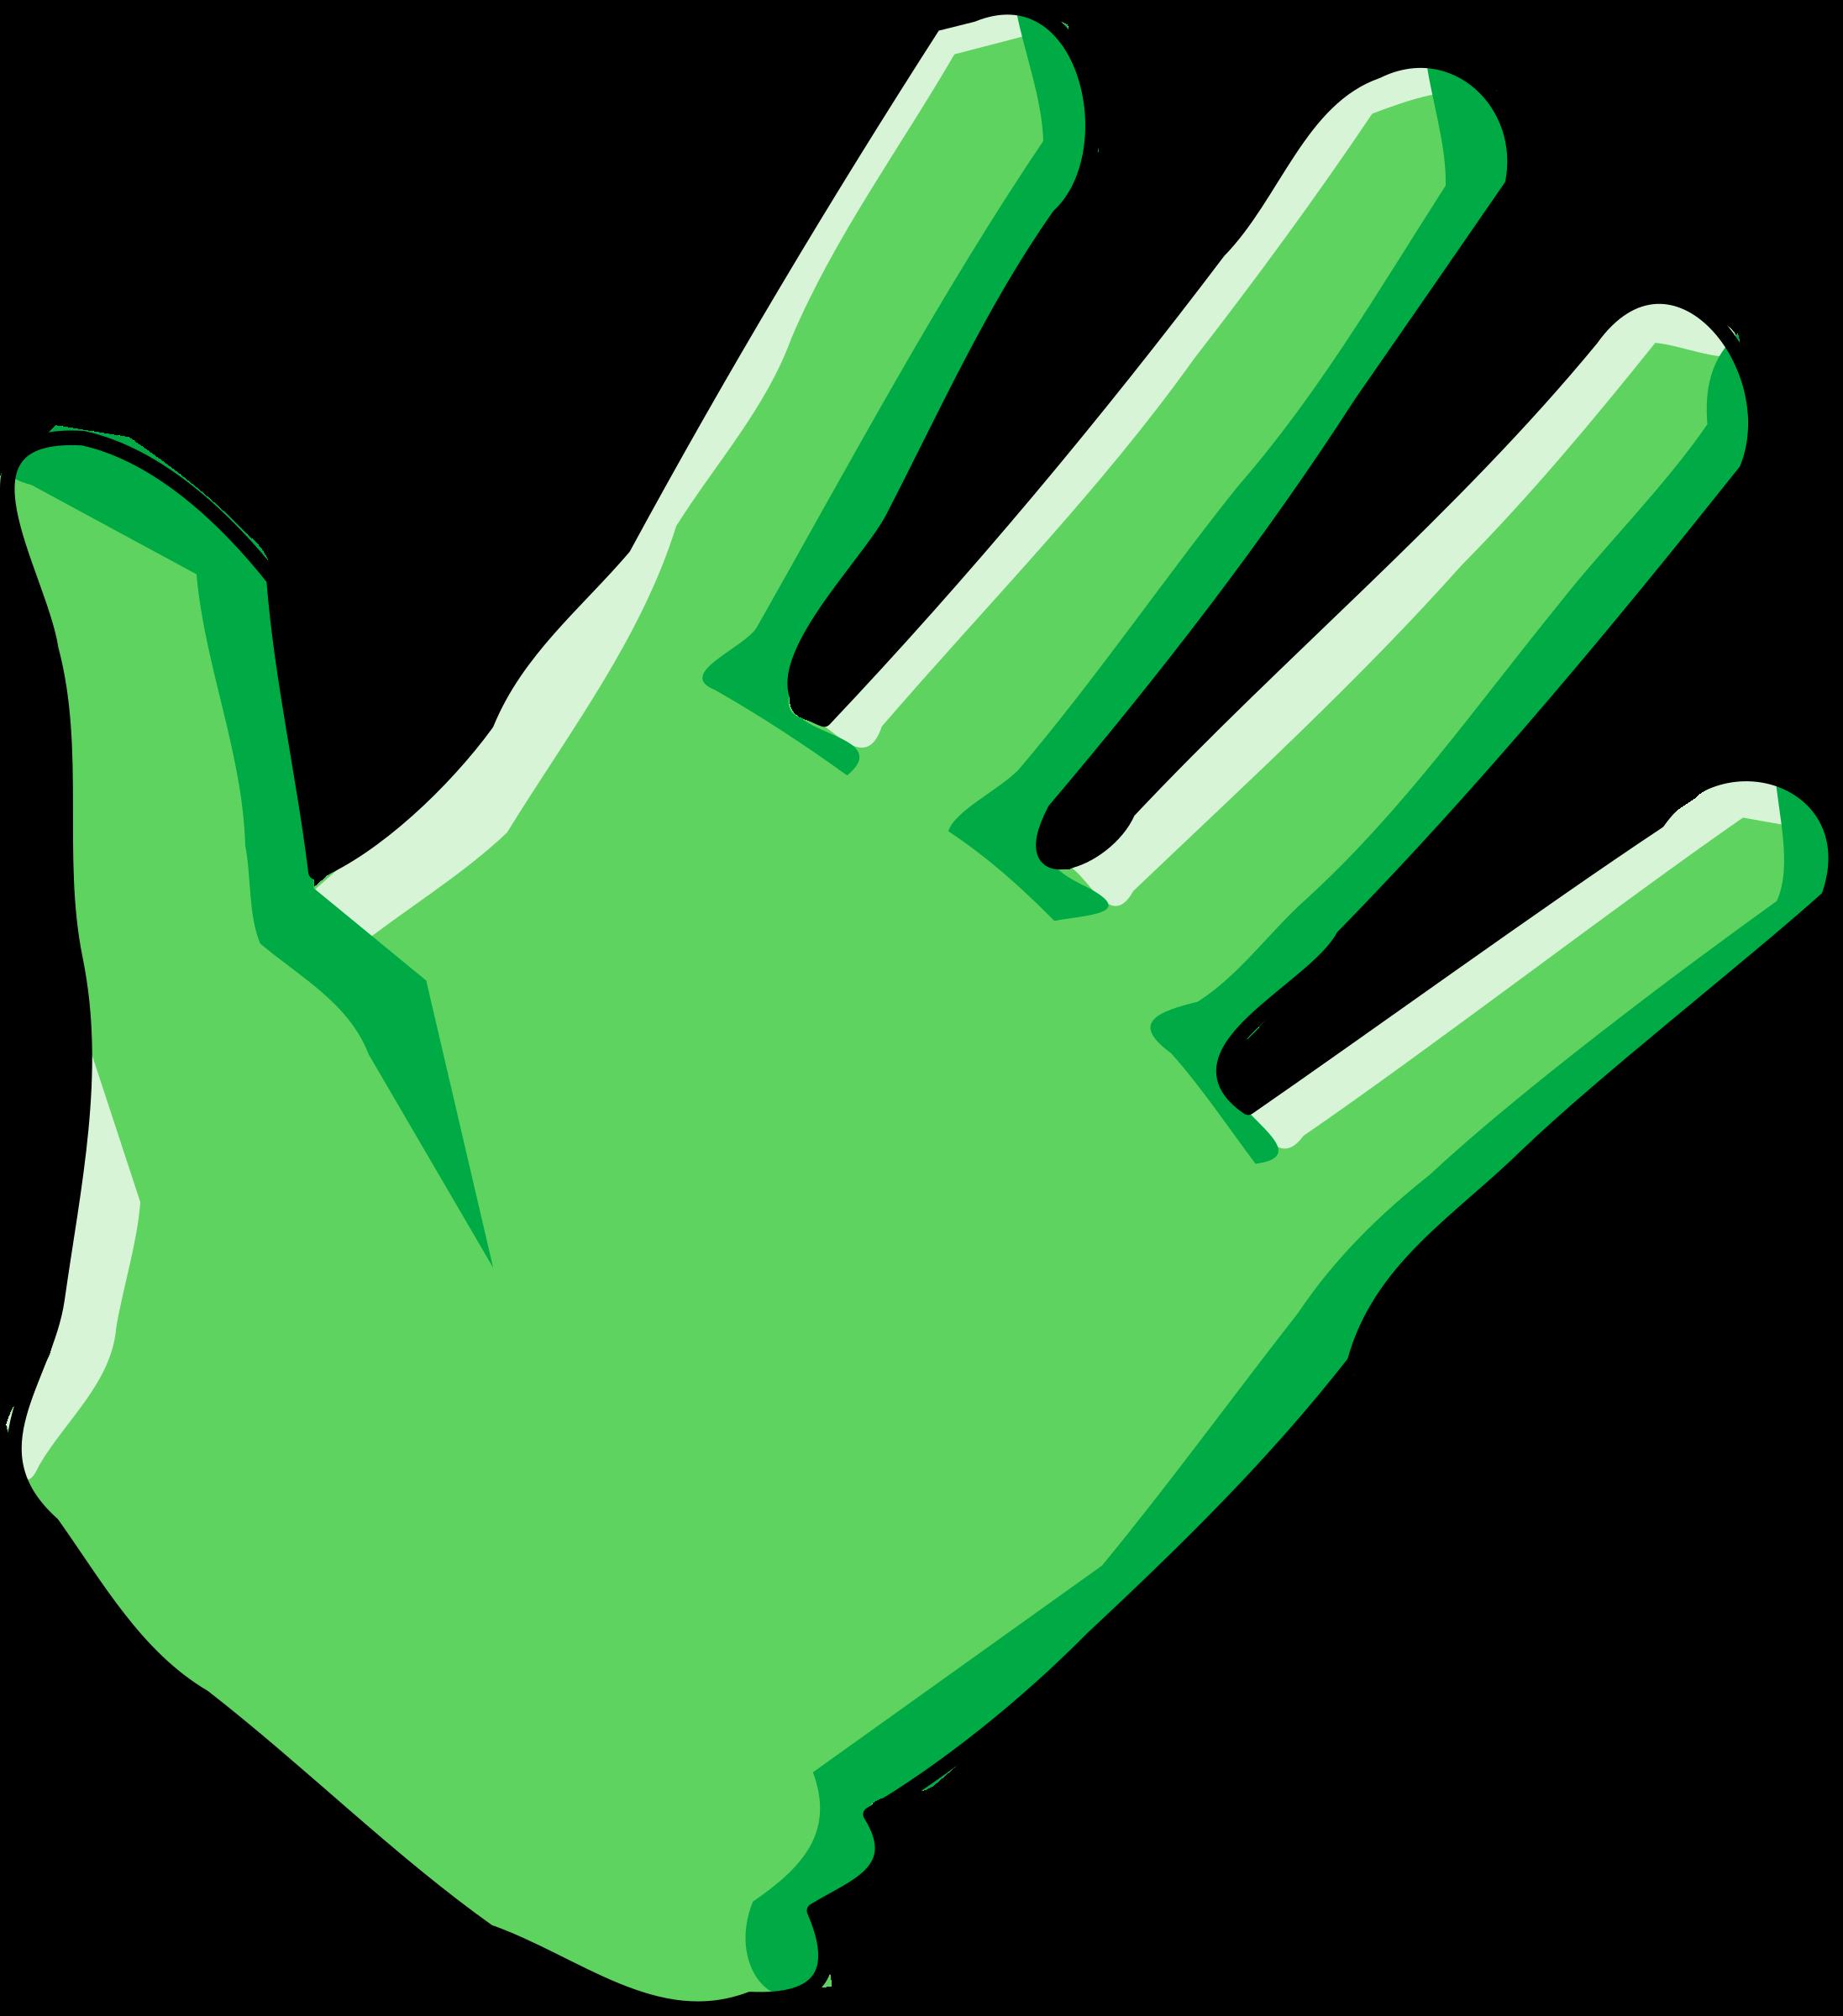 Glove clipart Glove Cleaning Cleaning glove Clipart